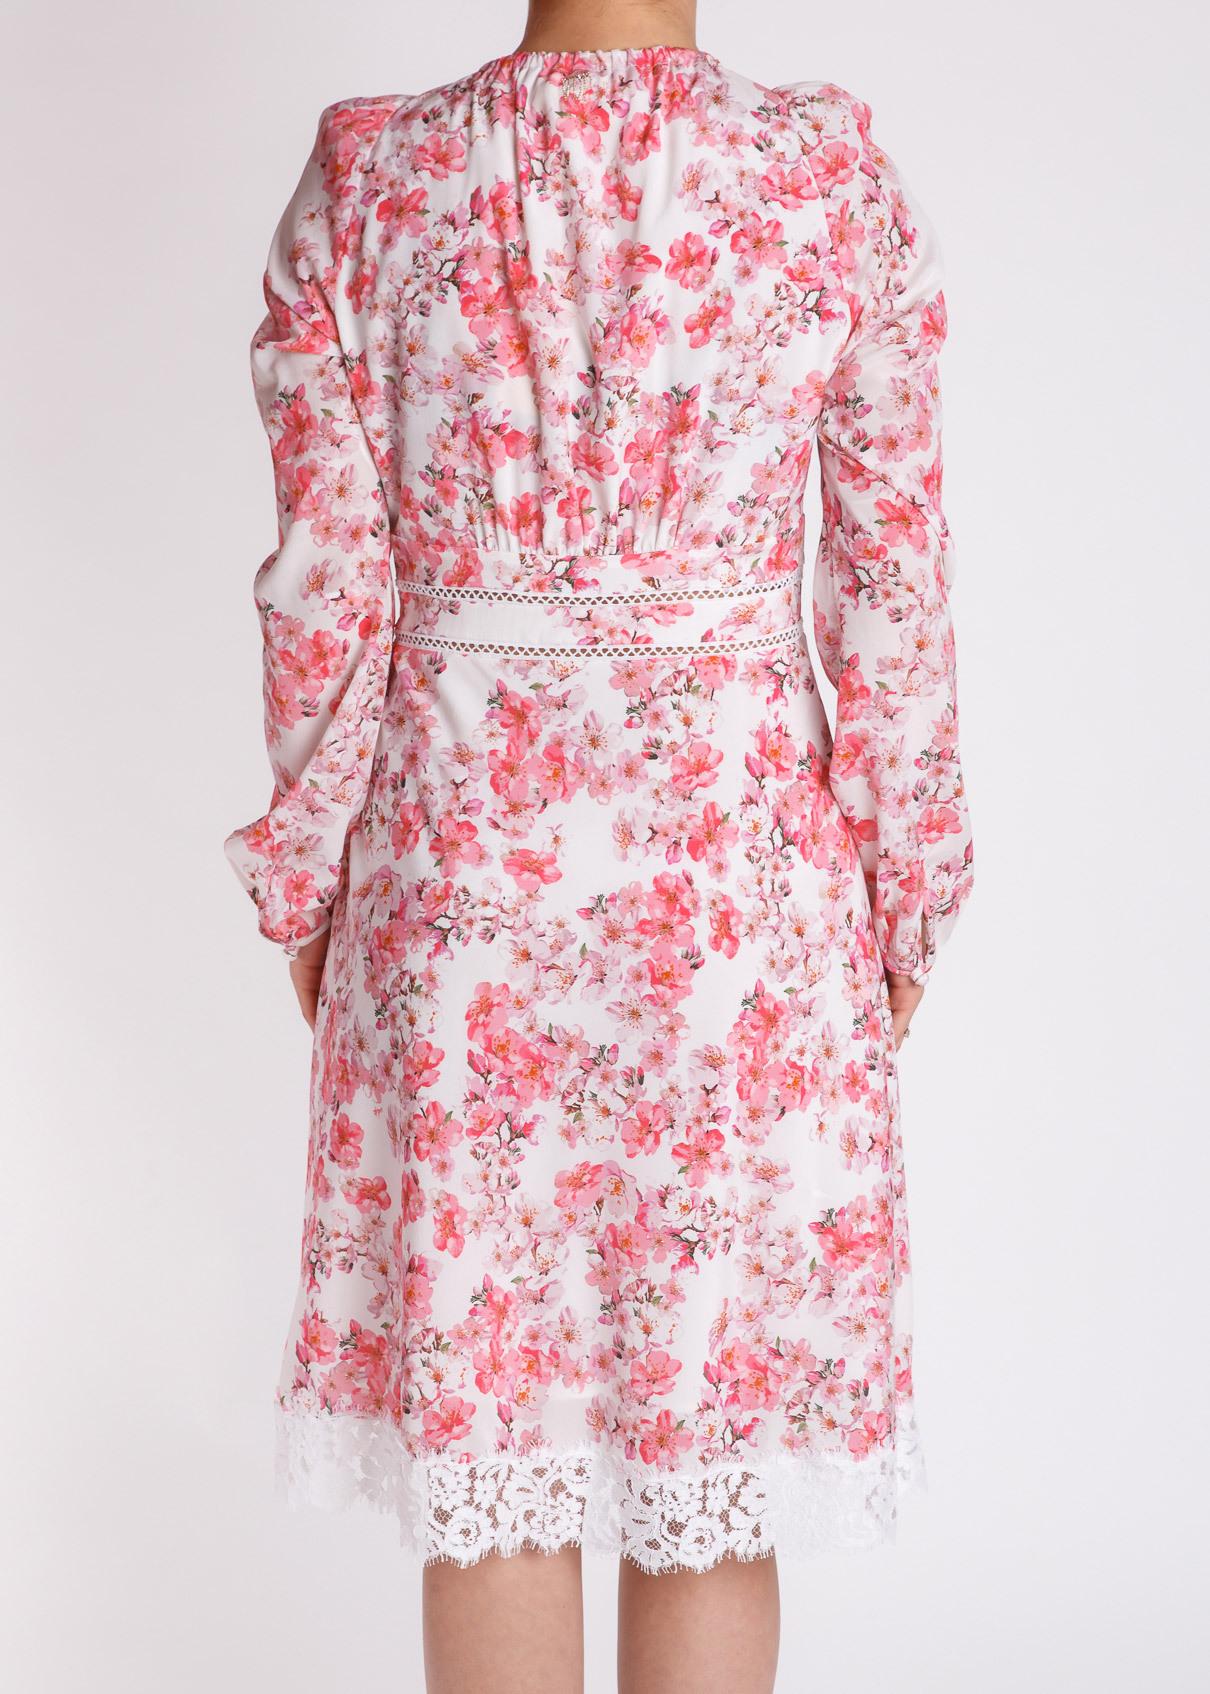 Весна лето платья доставка